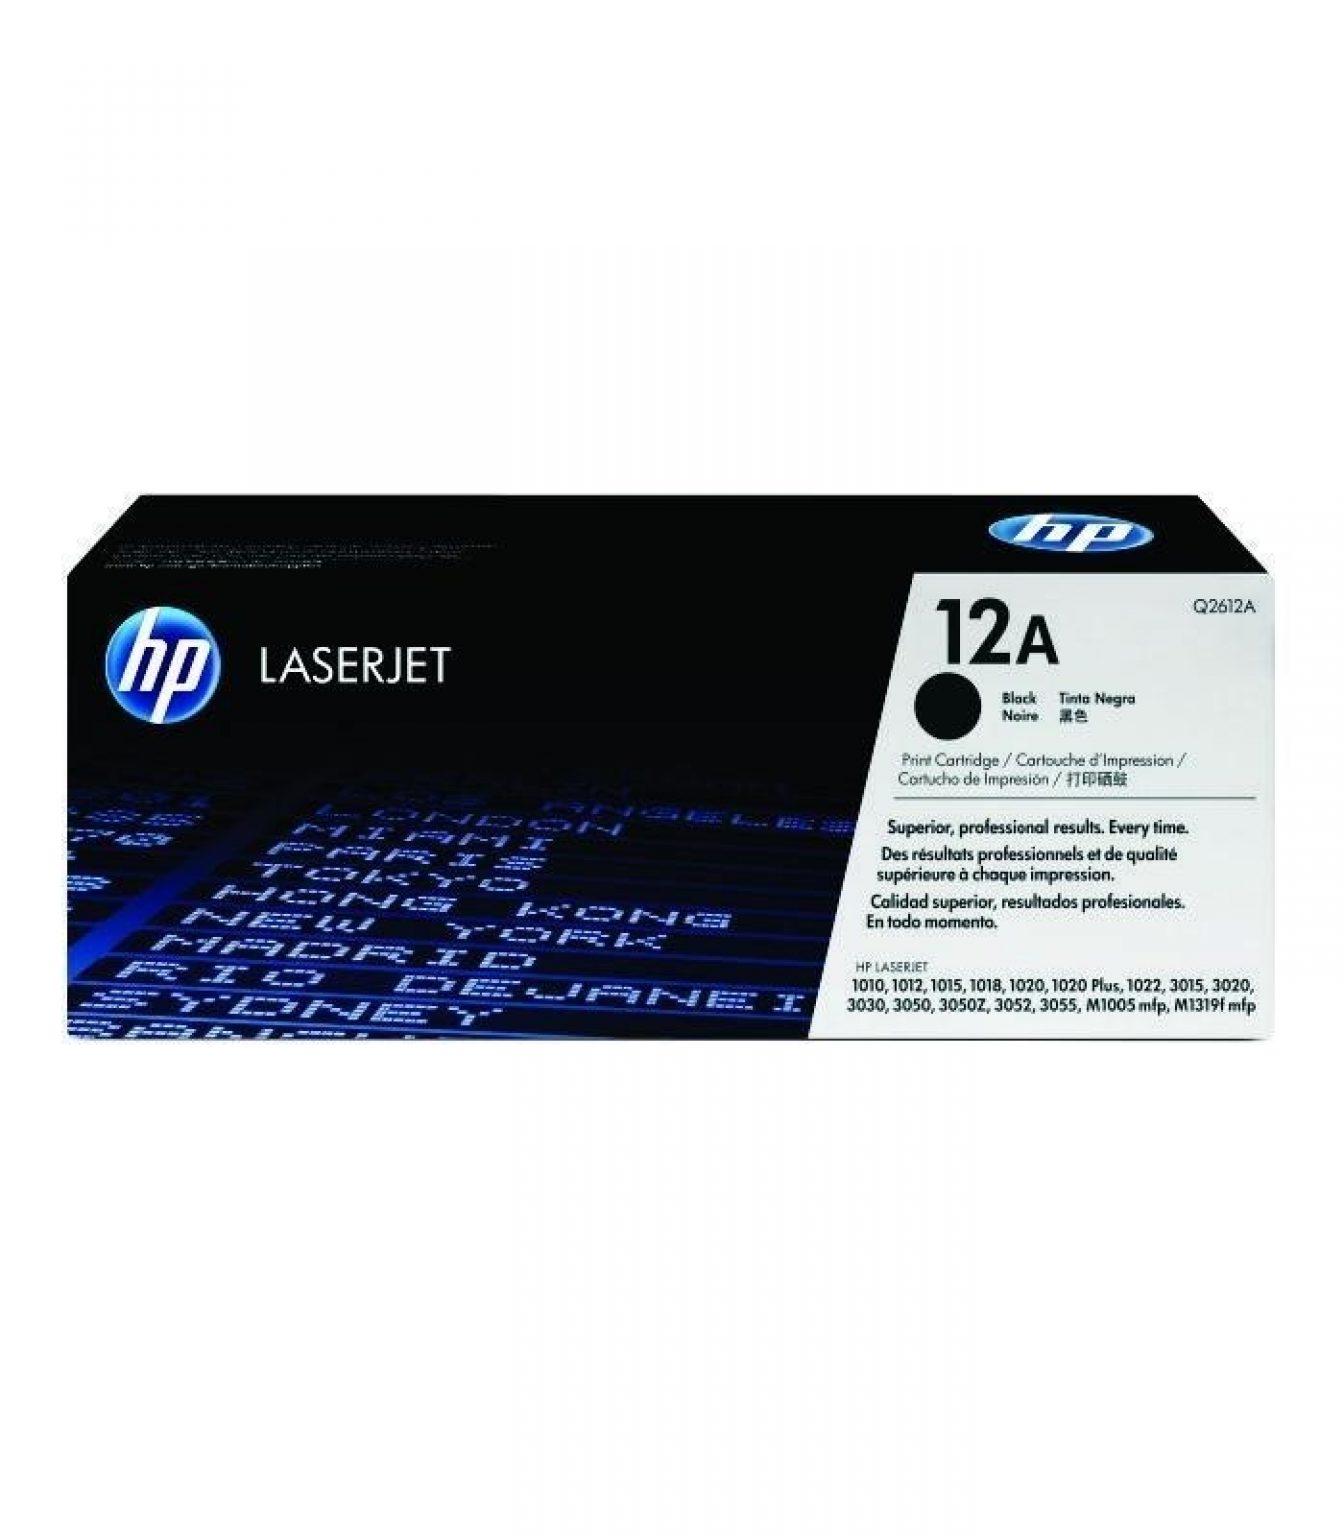 HP - LaserJet 1000/3000 Series Black Cartridge [Q2612A]